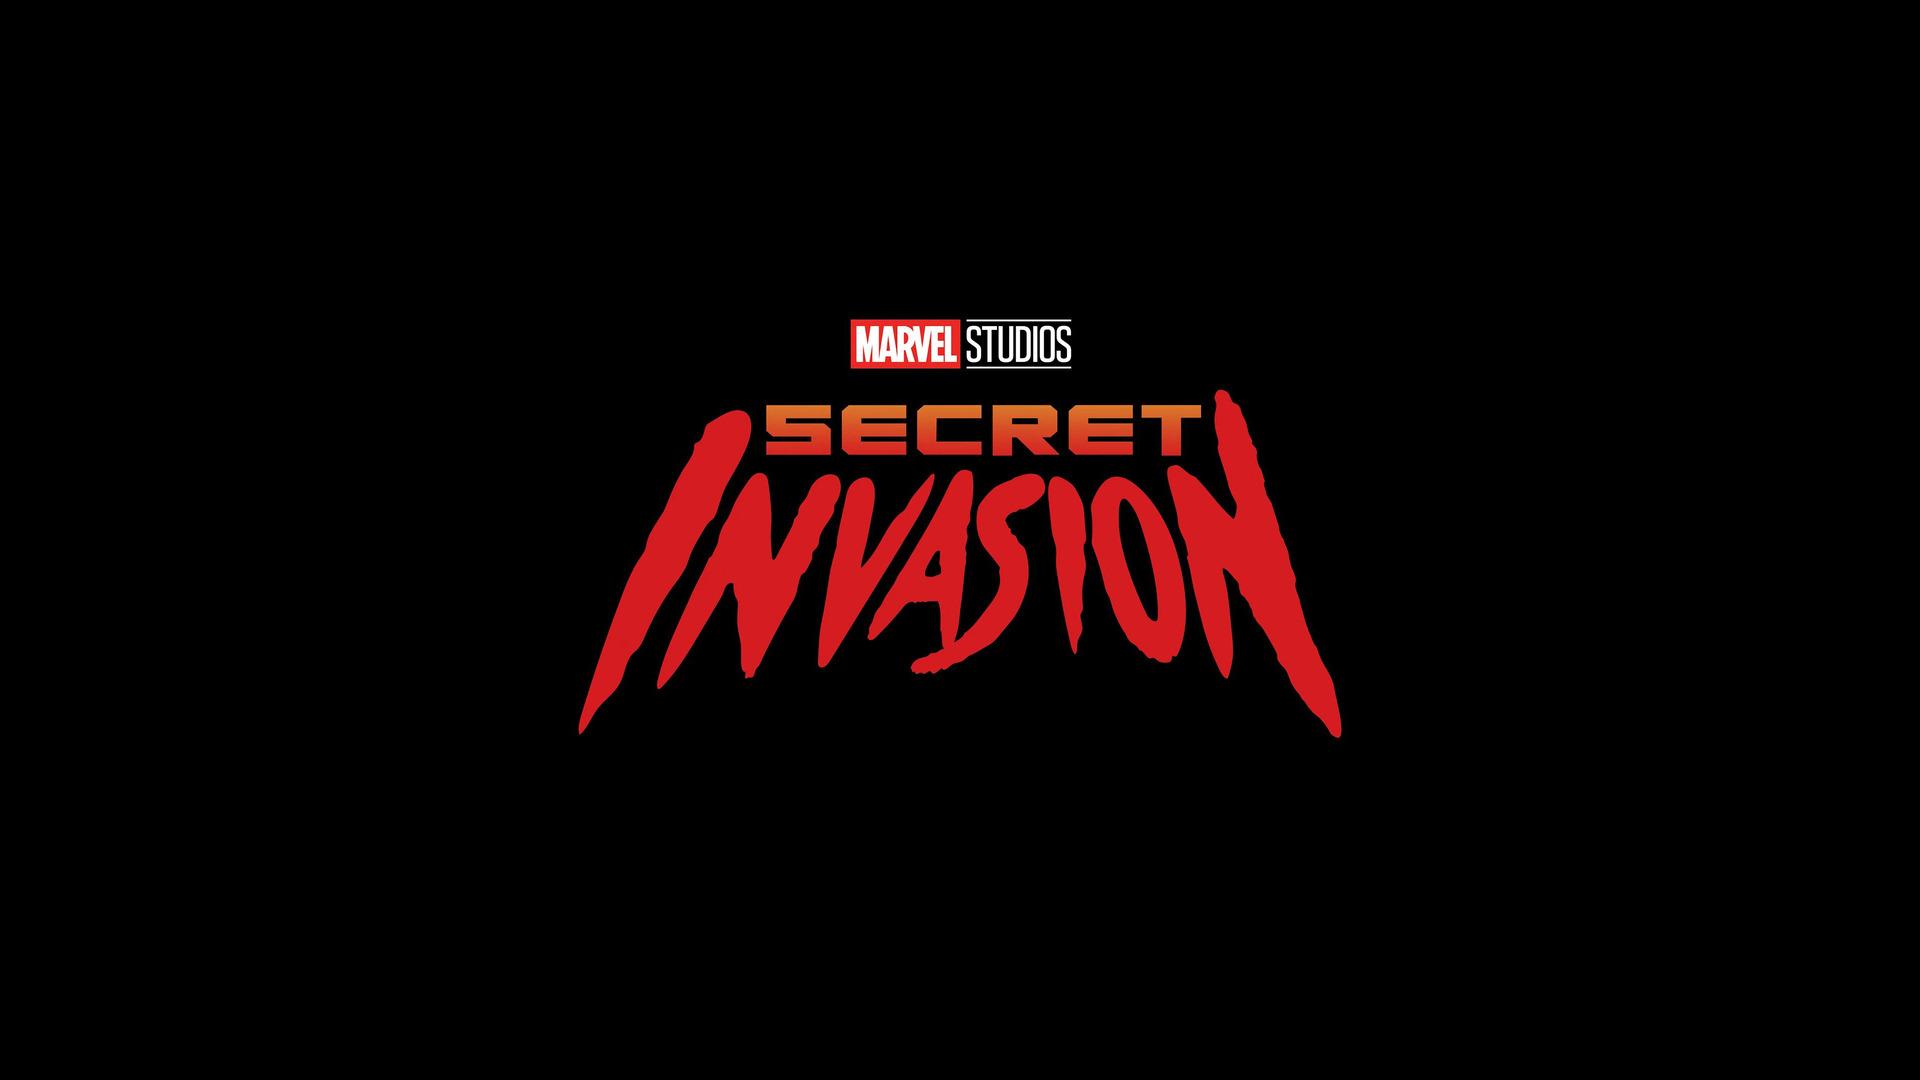 Show Secret Invasion